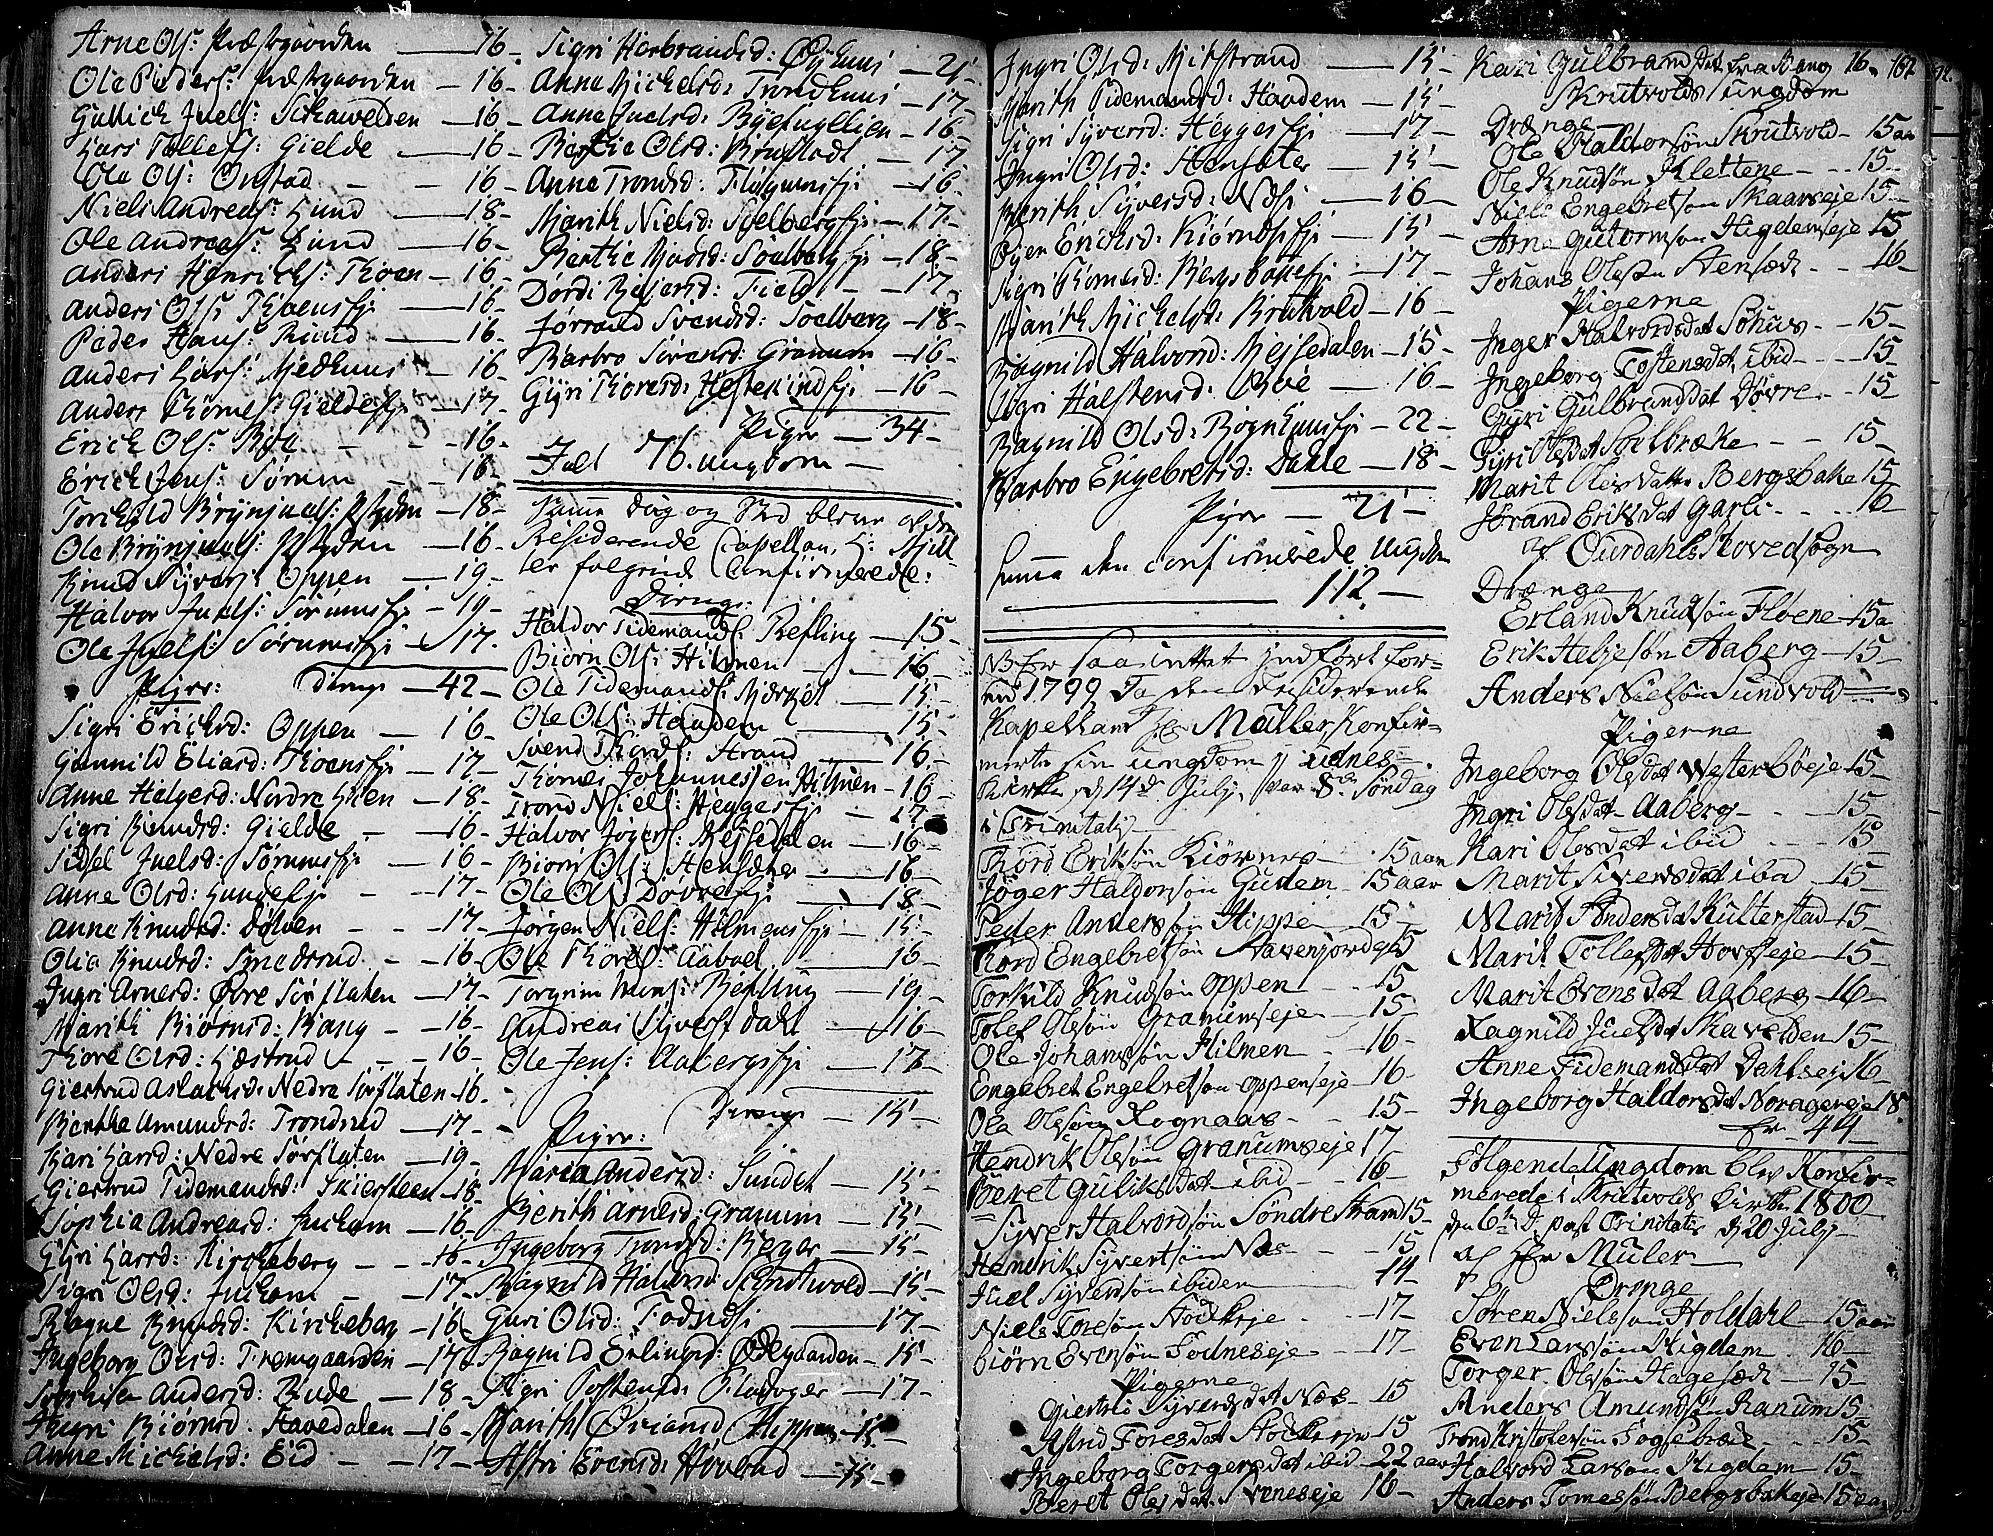 SAH, Aurdal prestekontor, Ministerialbok nr. 6, 1781-1804, s. 167